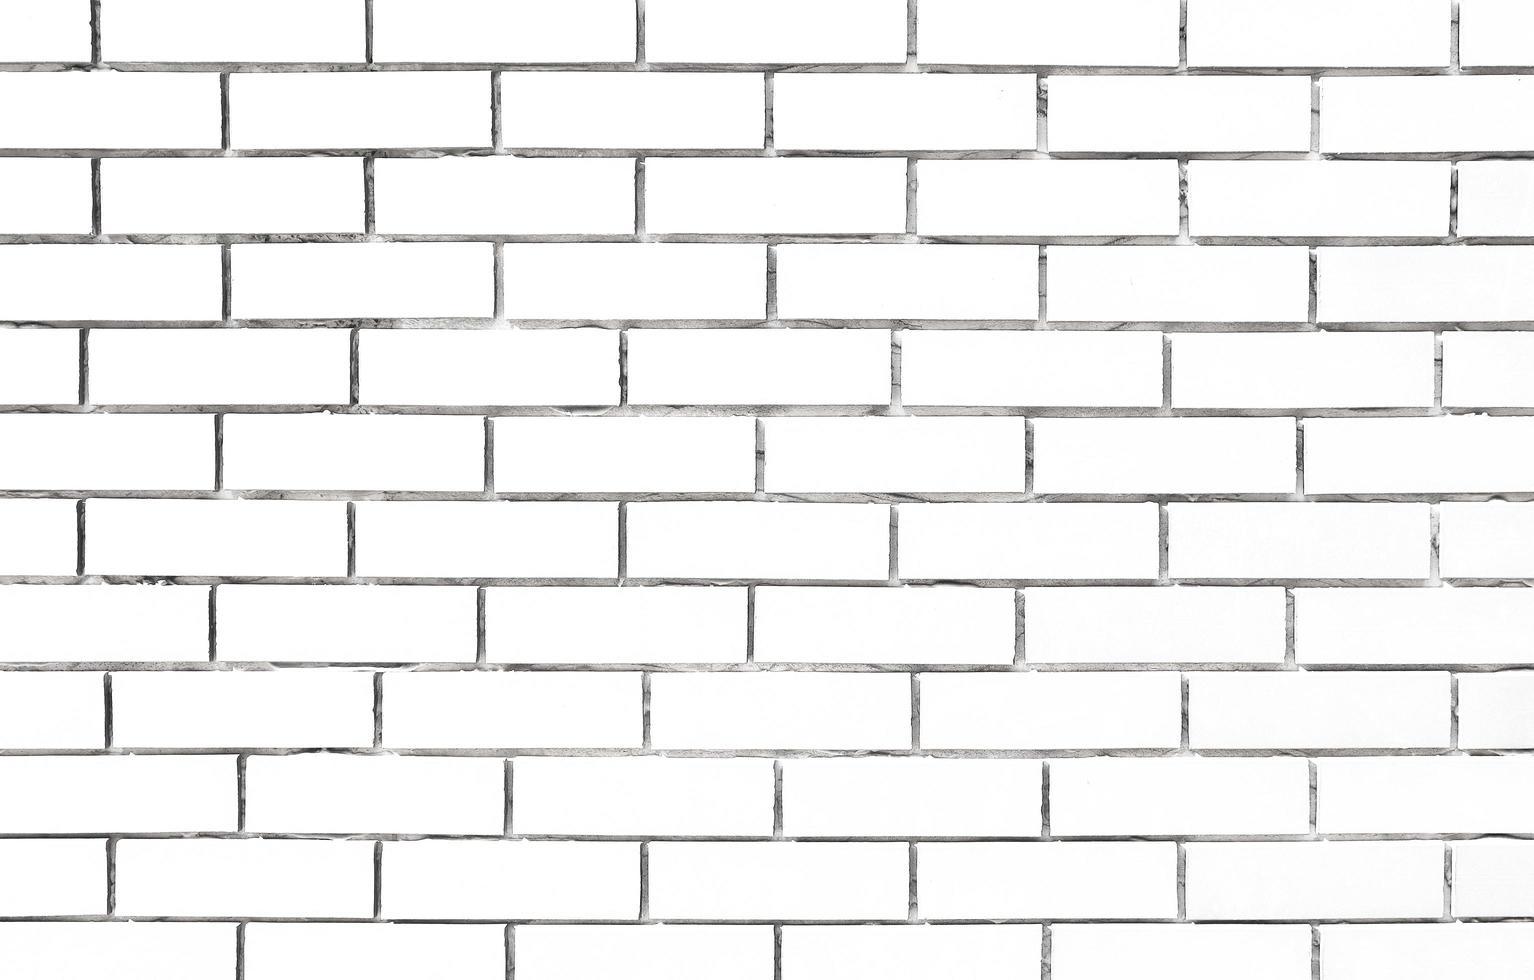 mur de béton blanc texture photo